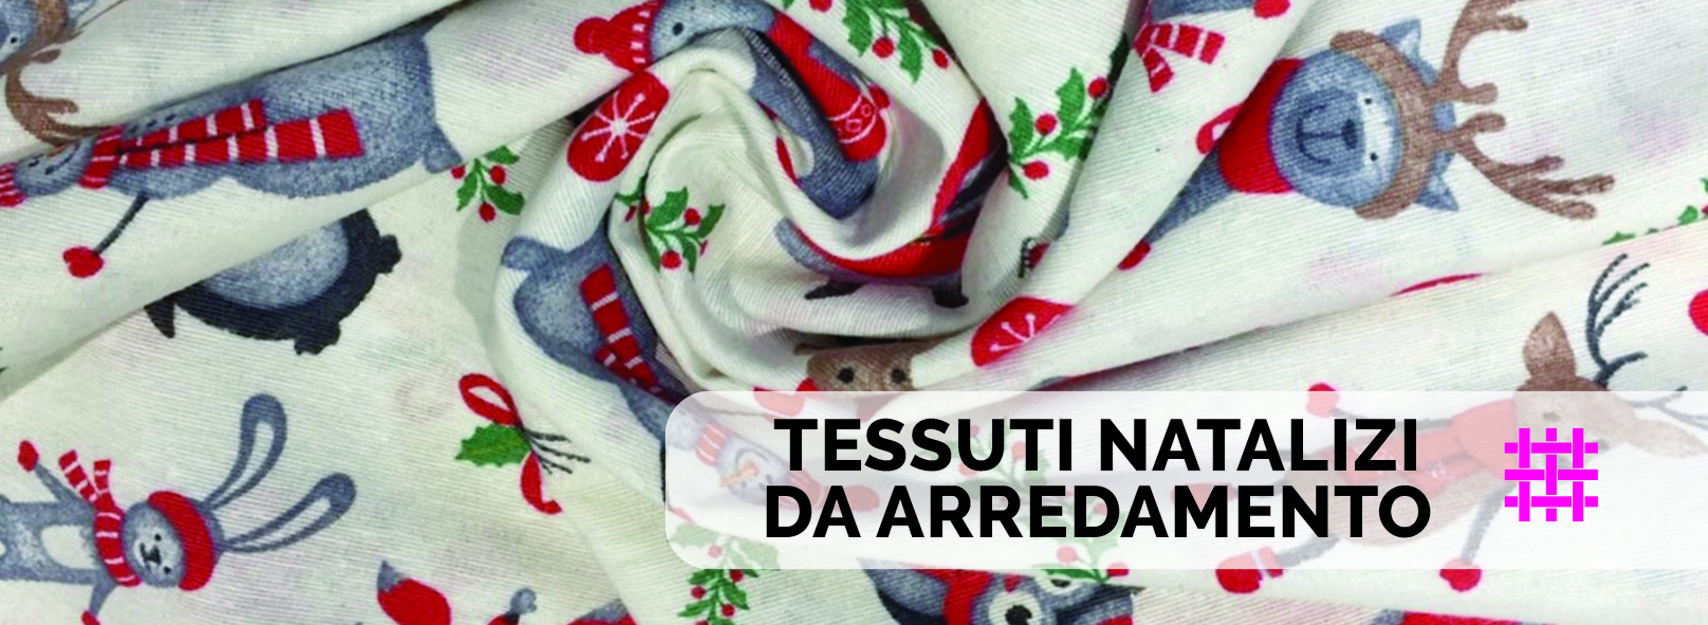 TESSUTI ARREDAMENTO